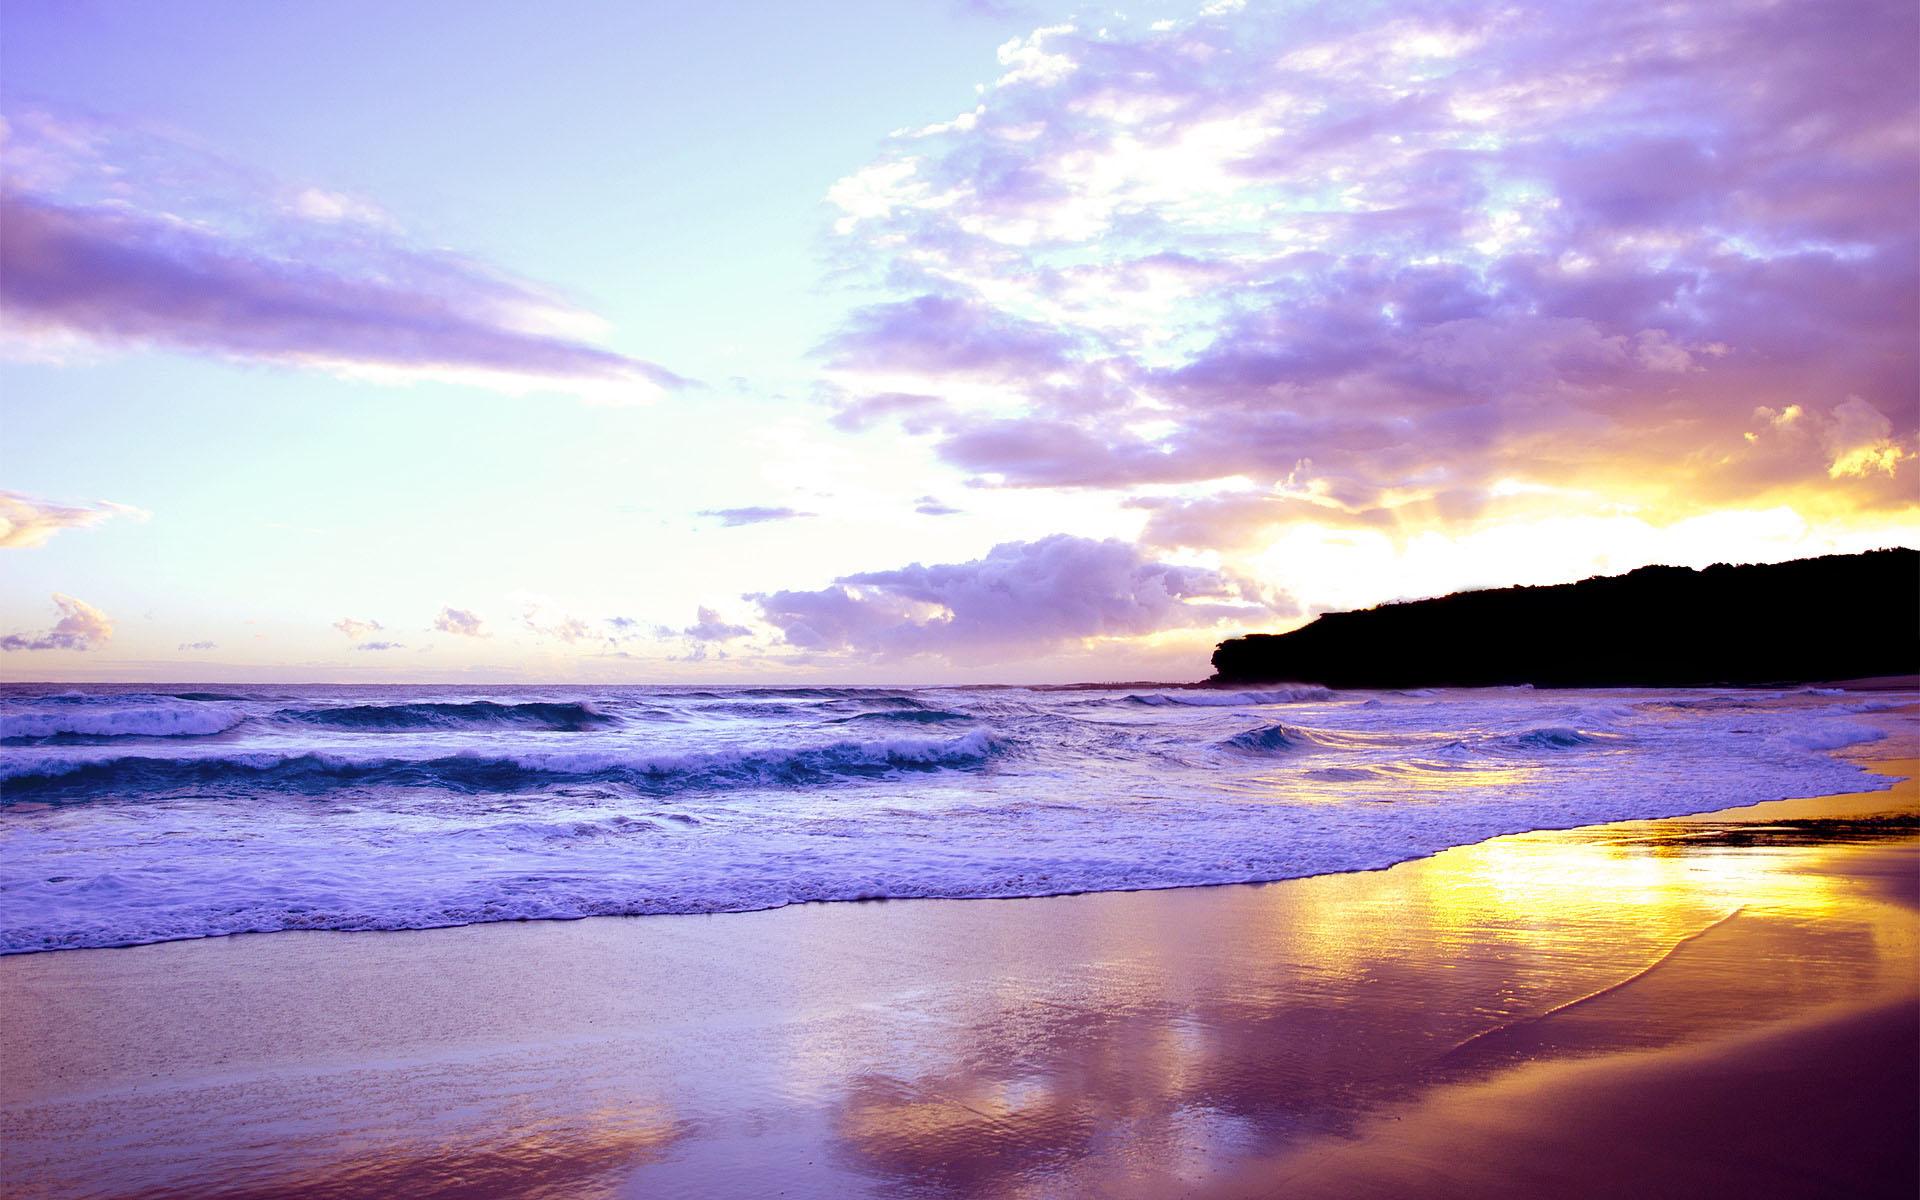 sunset wallpapers beach purple